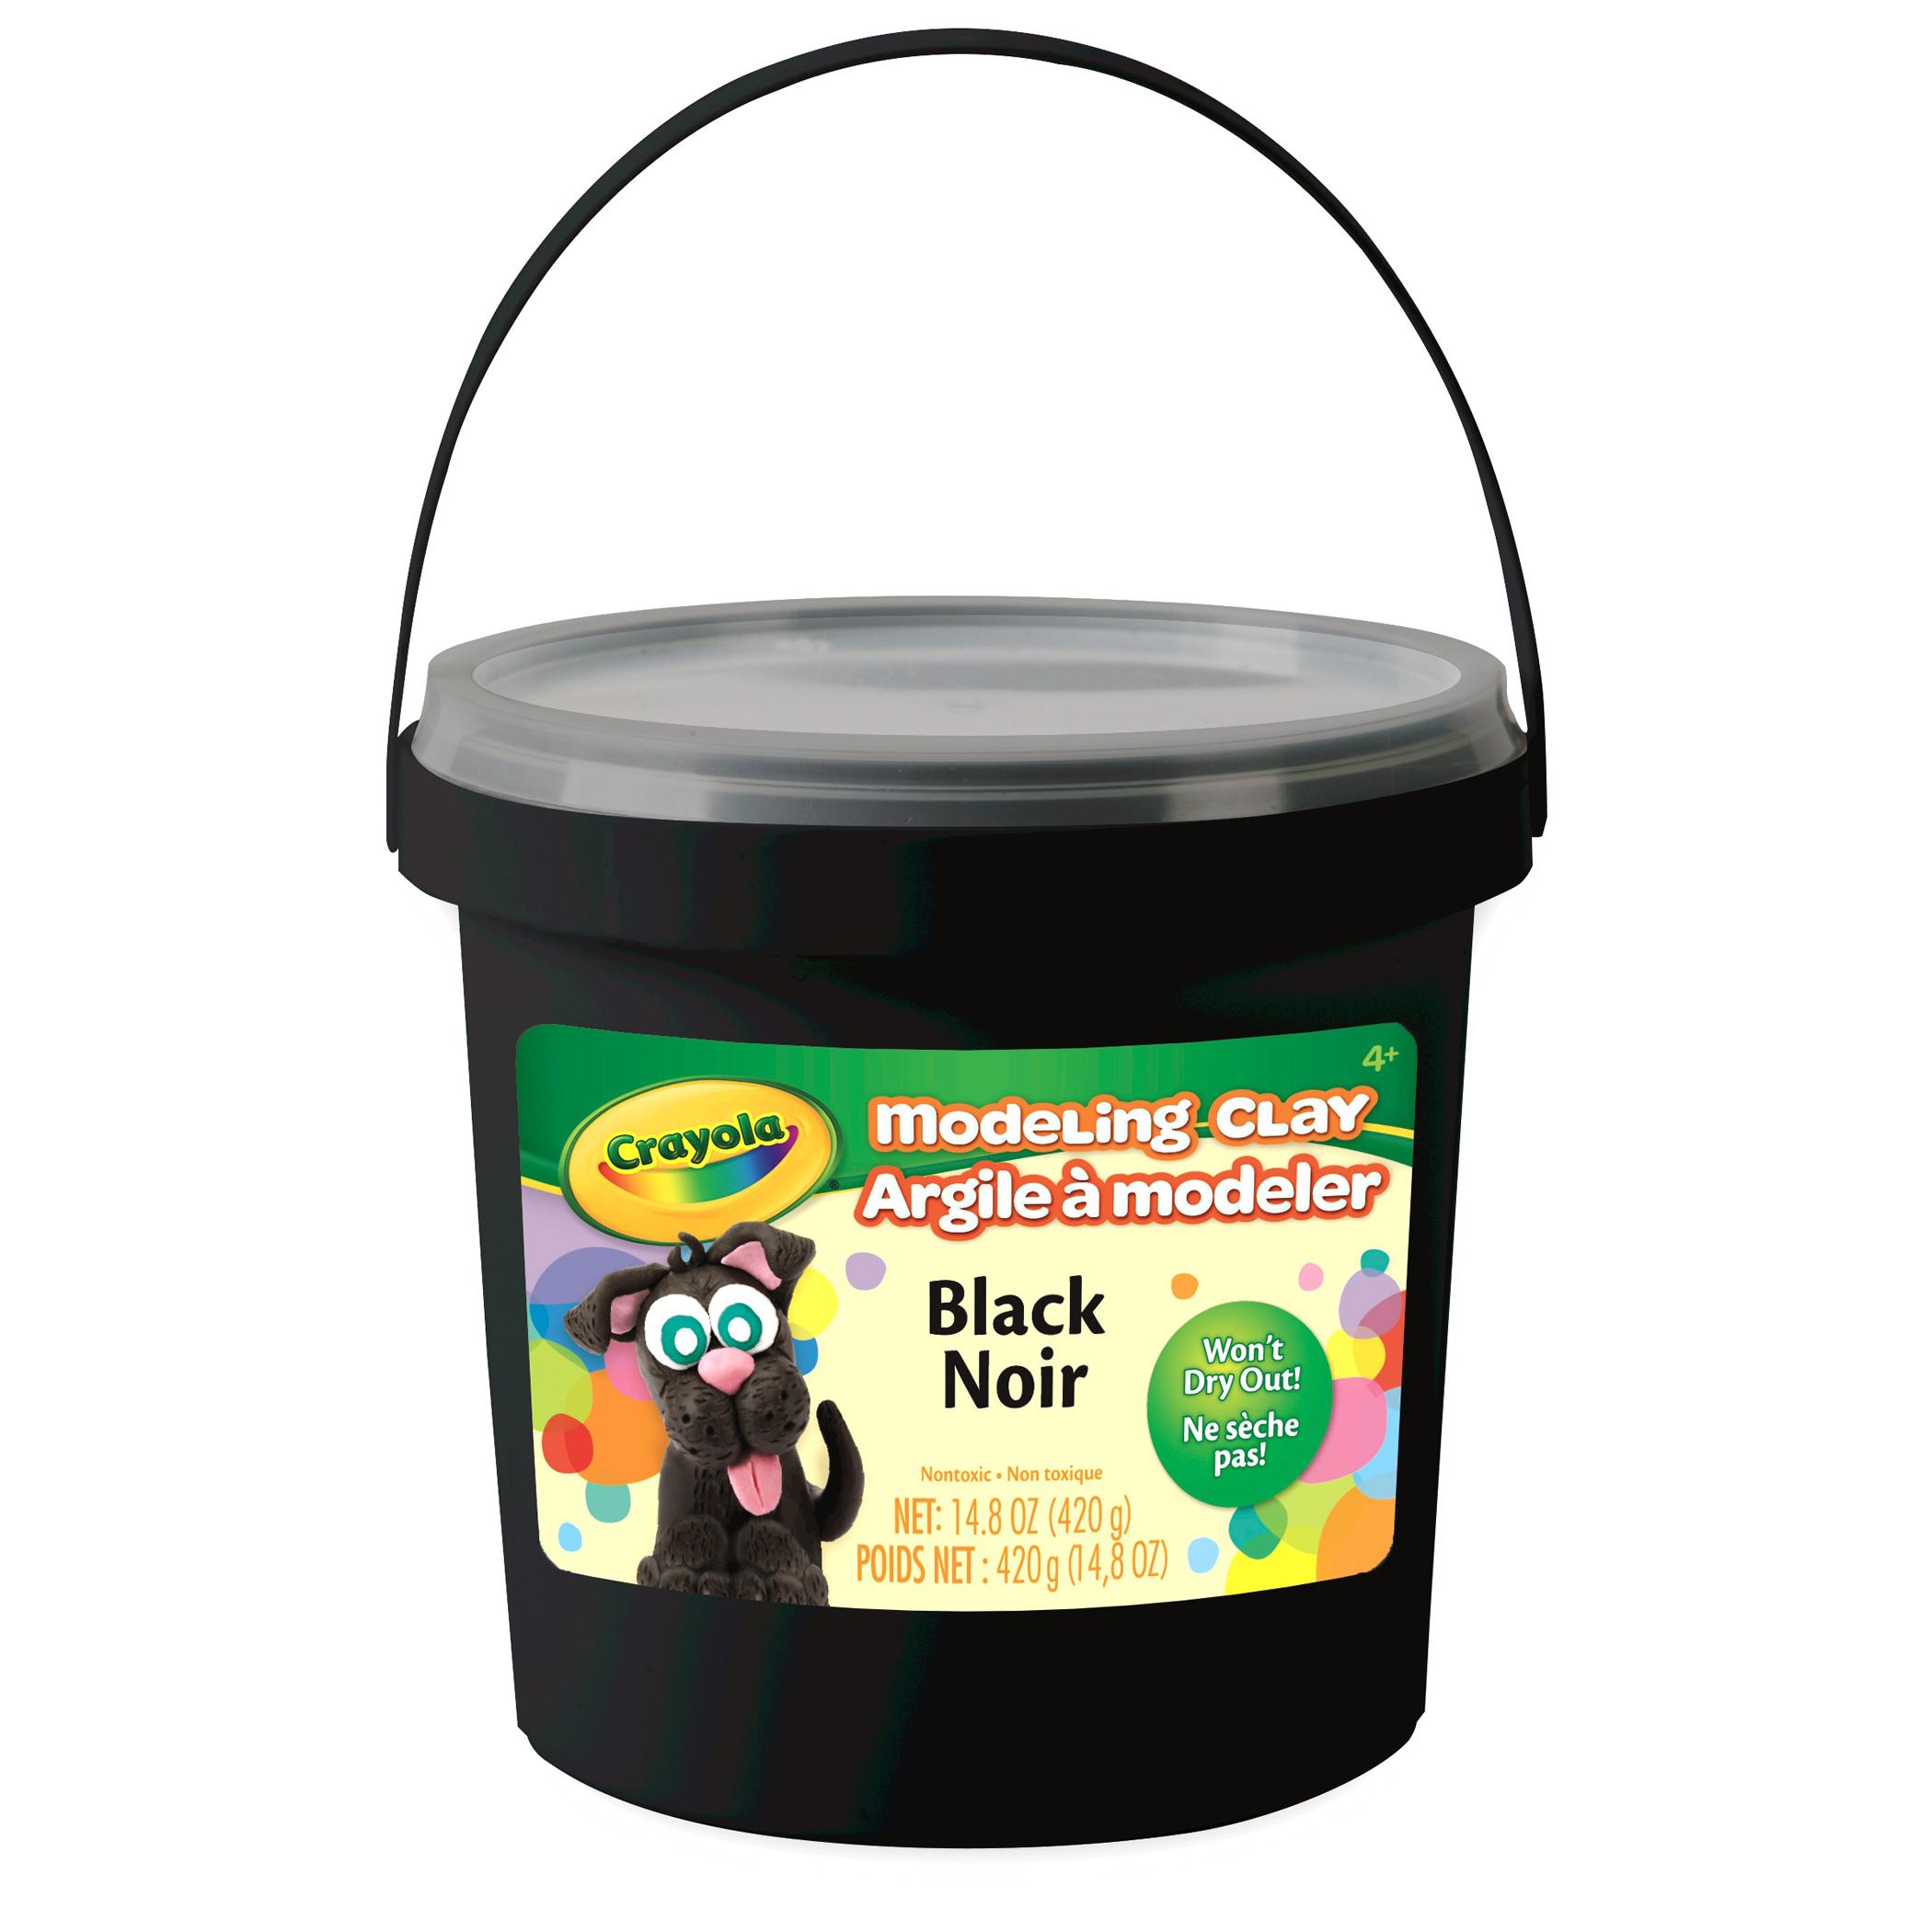 Crayola Modeling Clay 1 Lb Bucket, Black, Set Of 4 Buckets